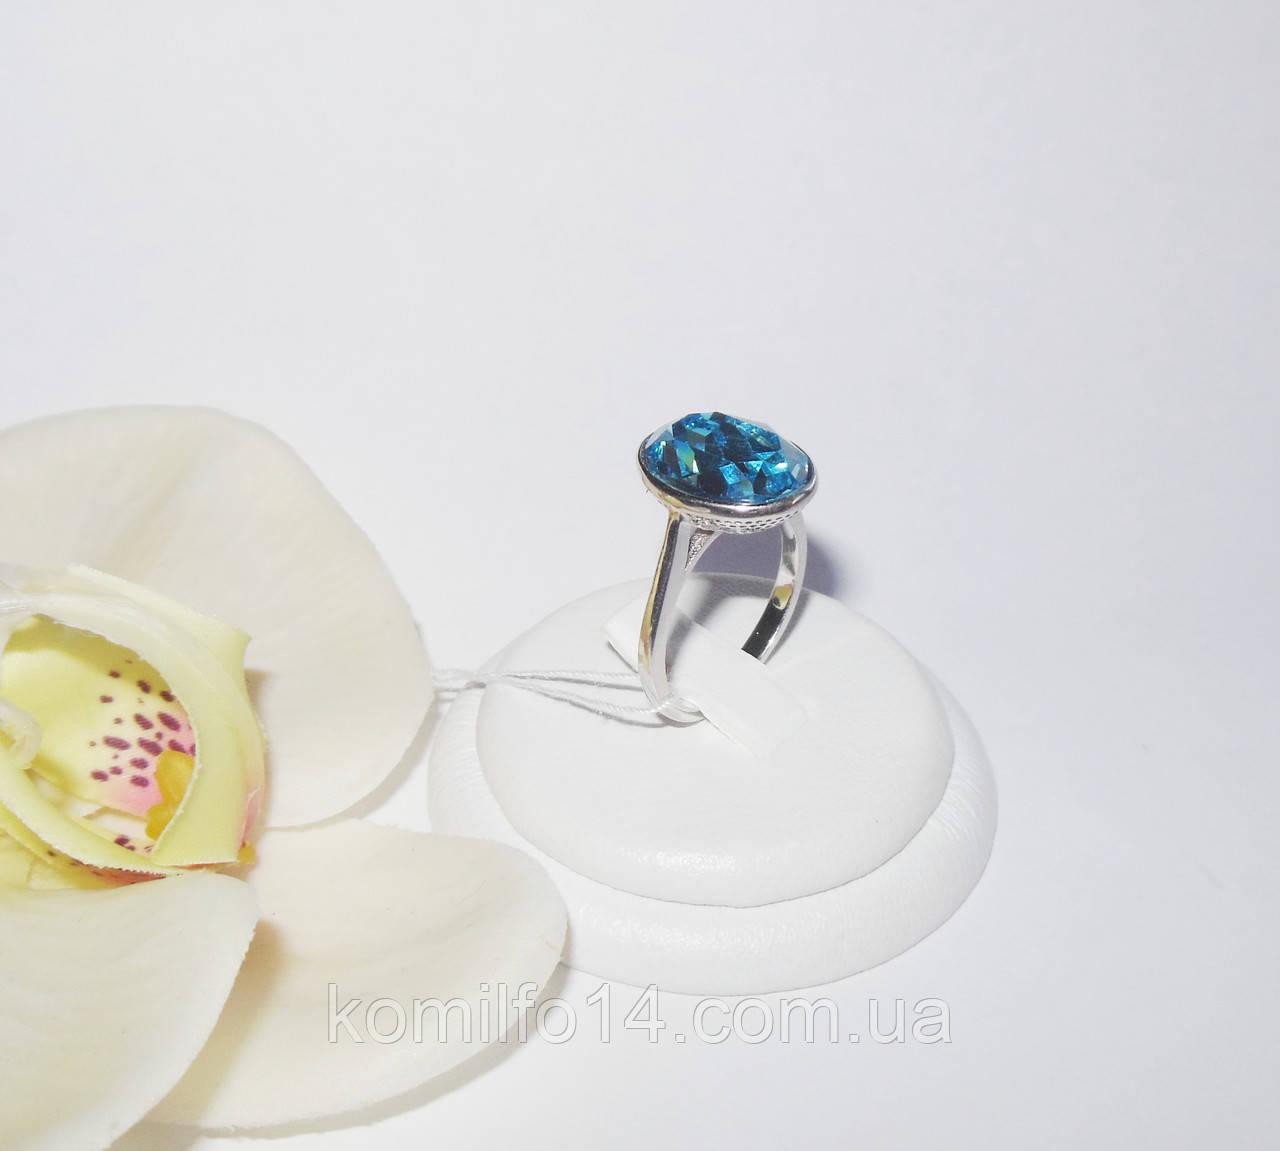 Серебряное кольцо с кристаллом Swarovski